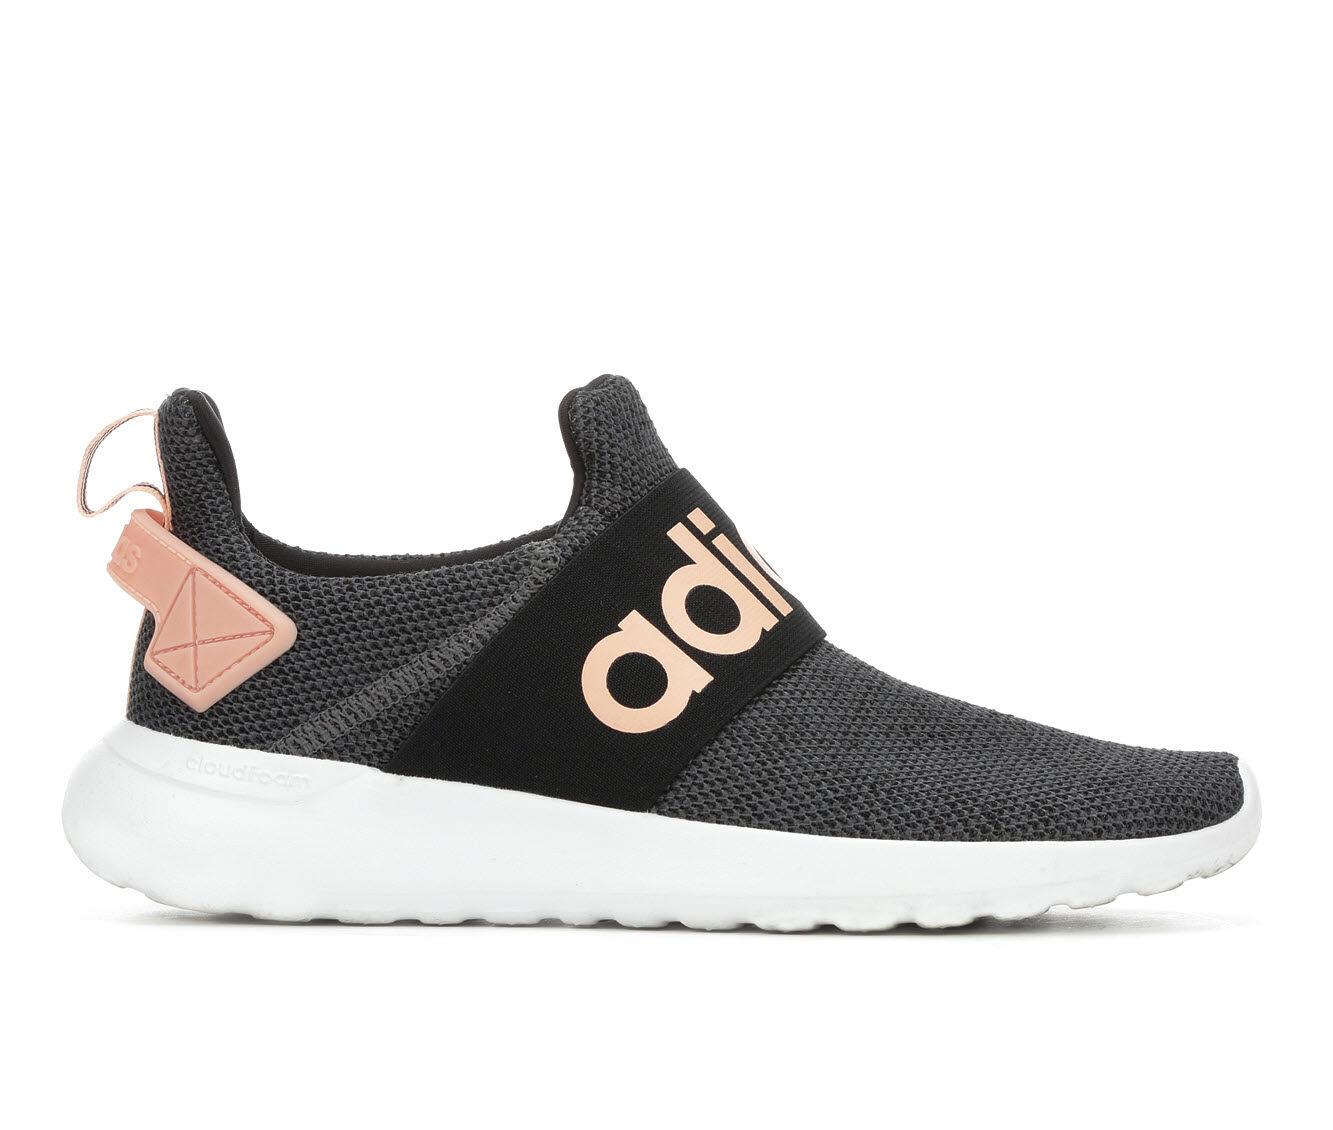 Women's Adidas Lite Racer Adapt Slip-On Sneakers Dark Grey/Pink